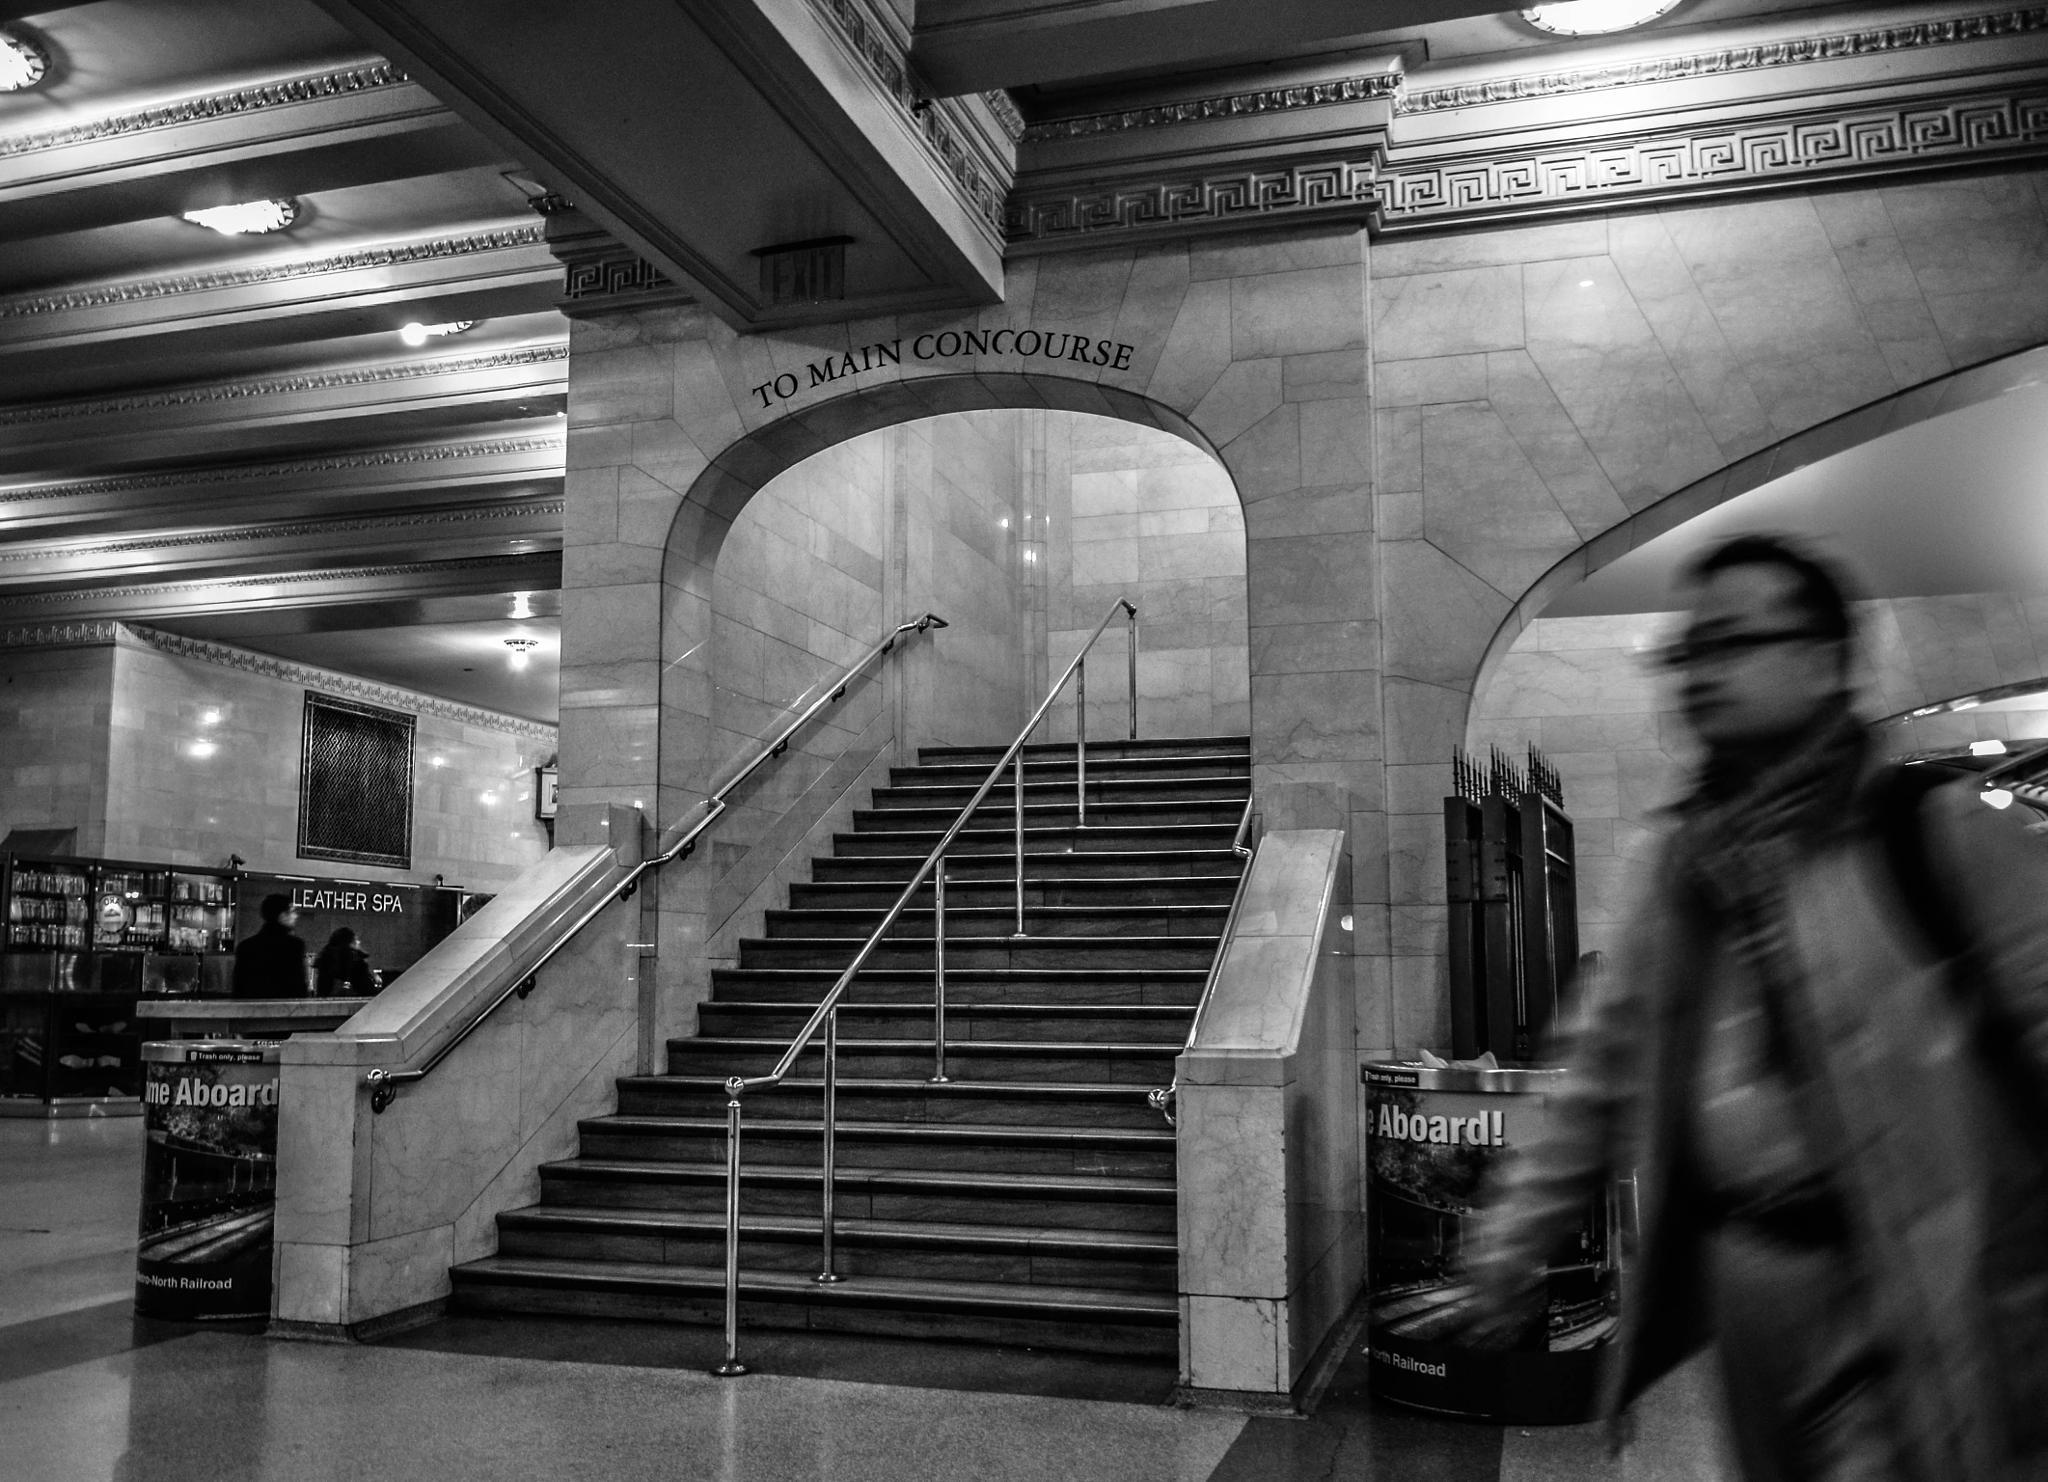 grand central station by jure kralj